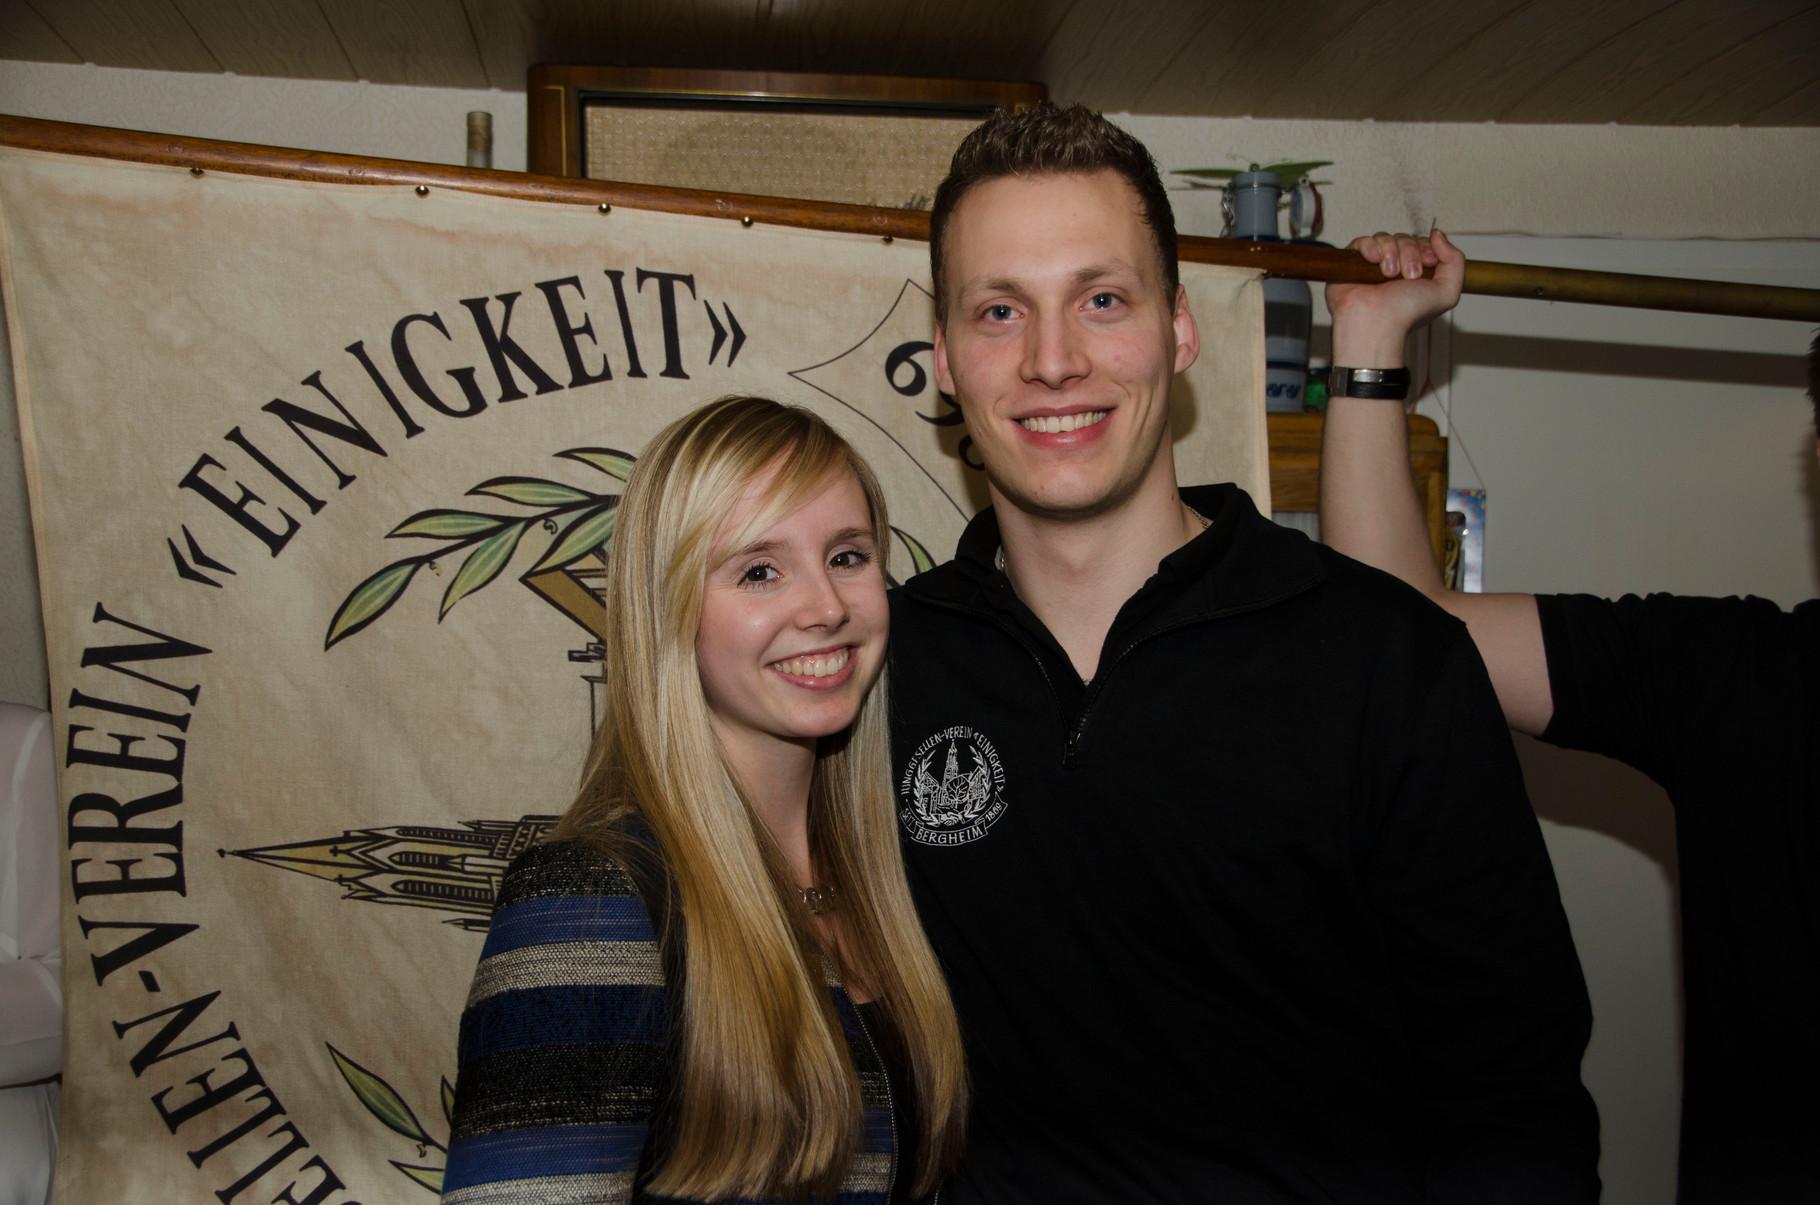 1. Maigrafenpaar: Andrea Oster & Marius von Seggern